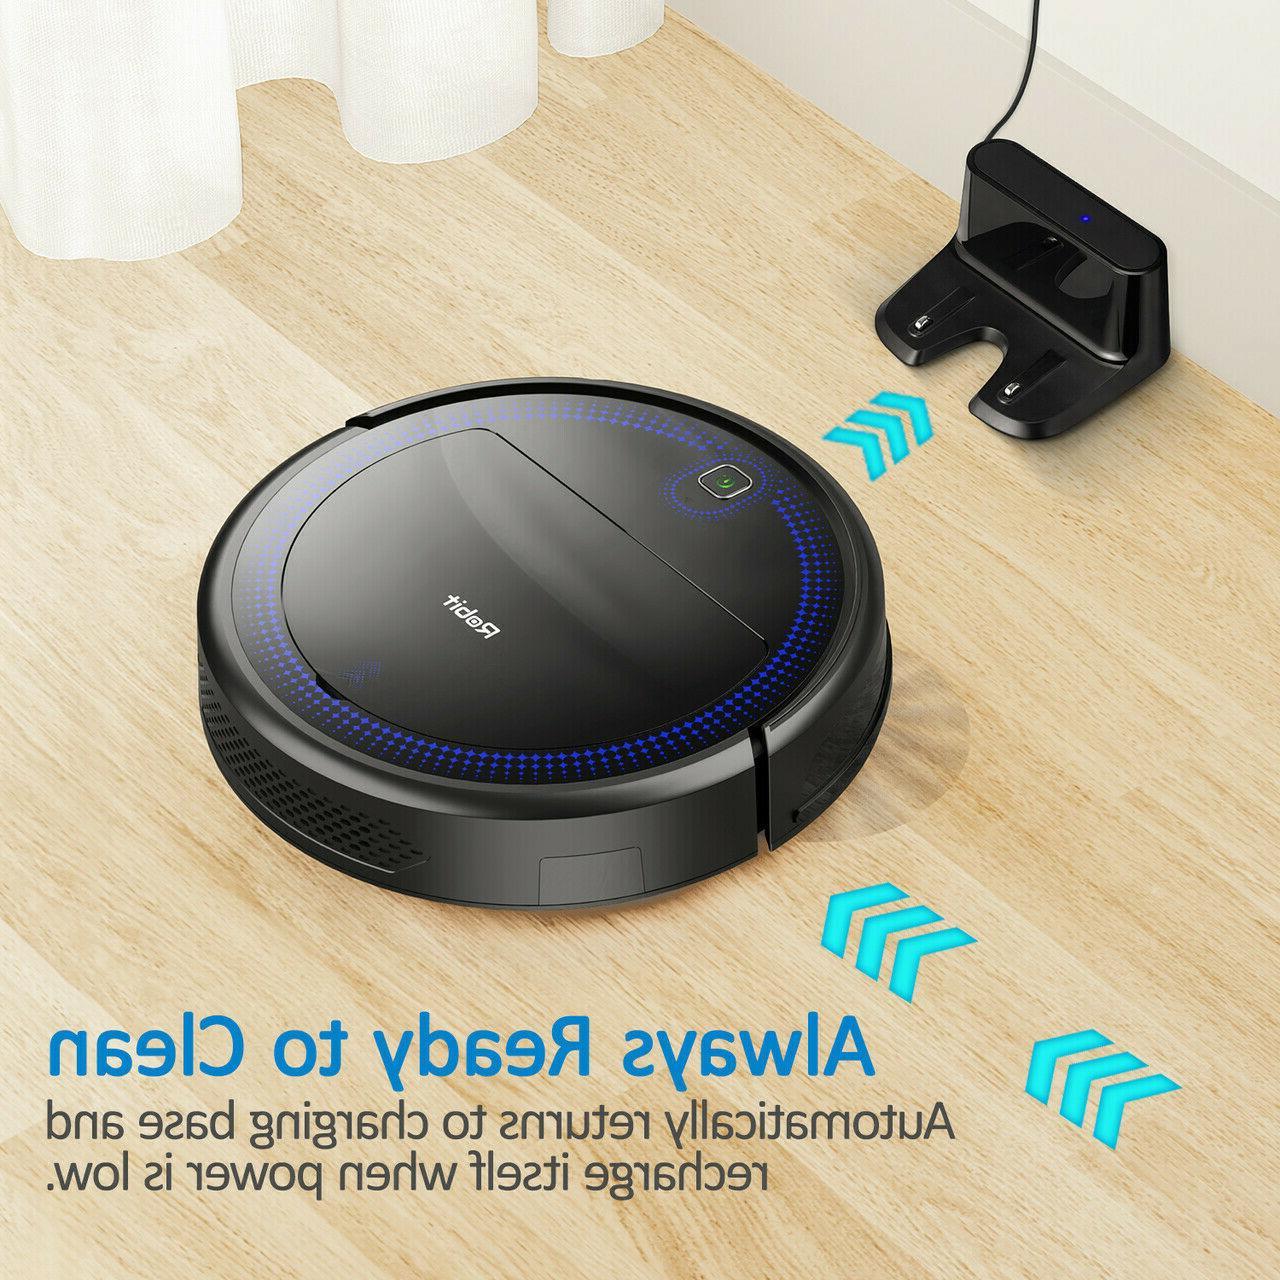 Housmile 2Ka Robotic Vacuum & w/ Remote